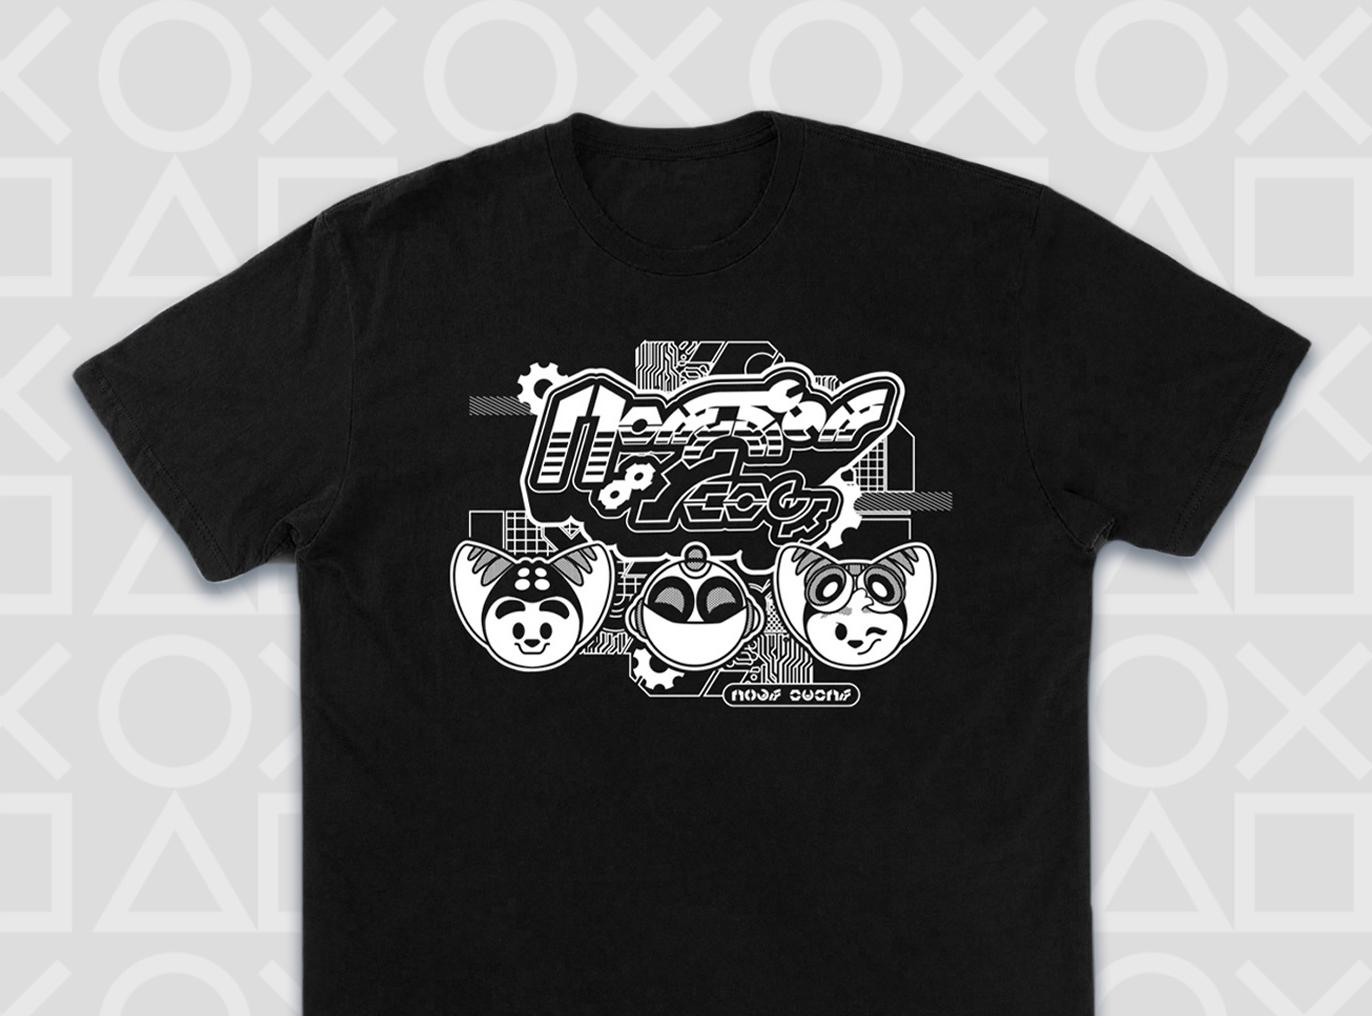 8015-t-shirt-rift-apart.jpg